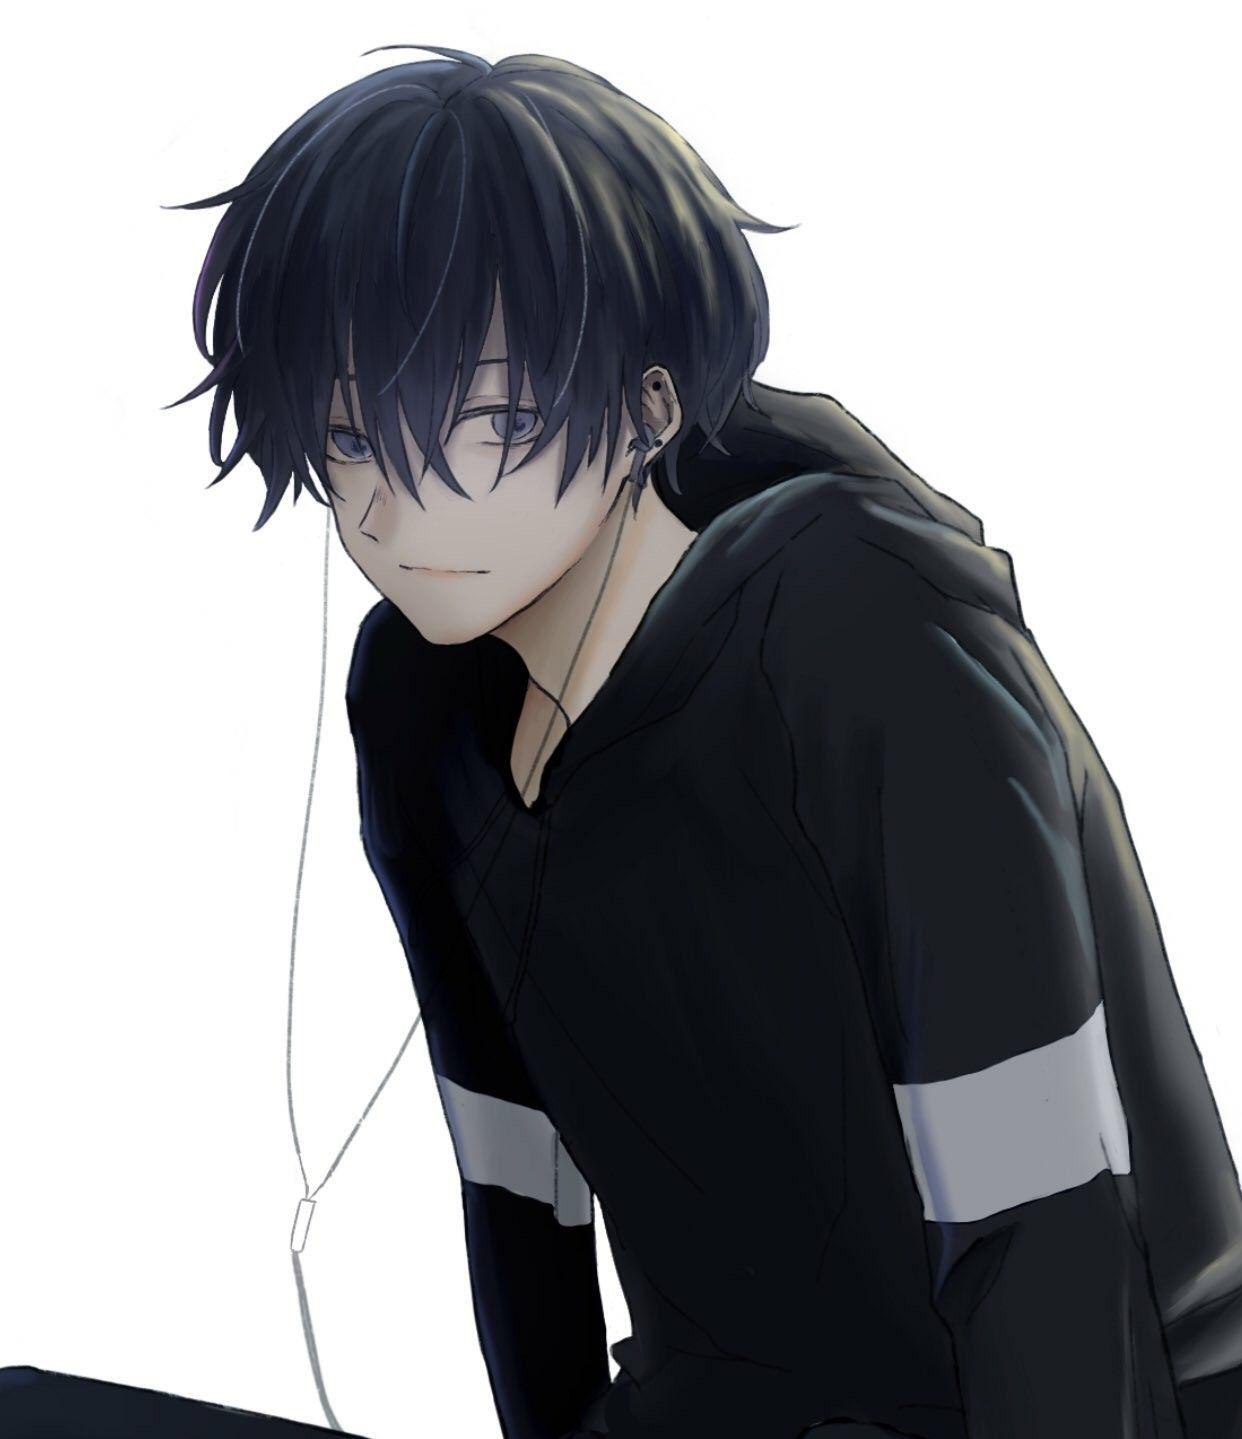 Save Follow 3 Lạ Anime Drawings Boy Cute Anime Boy Dark Anime